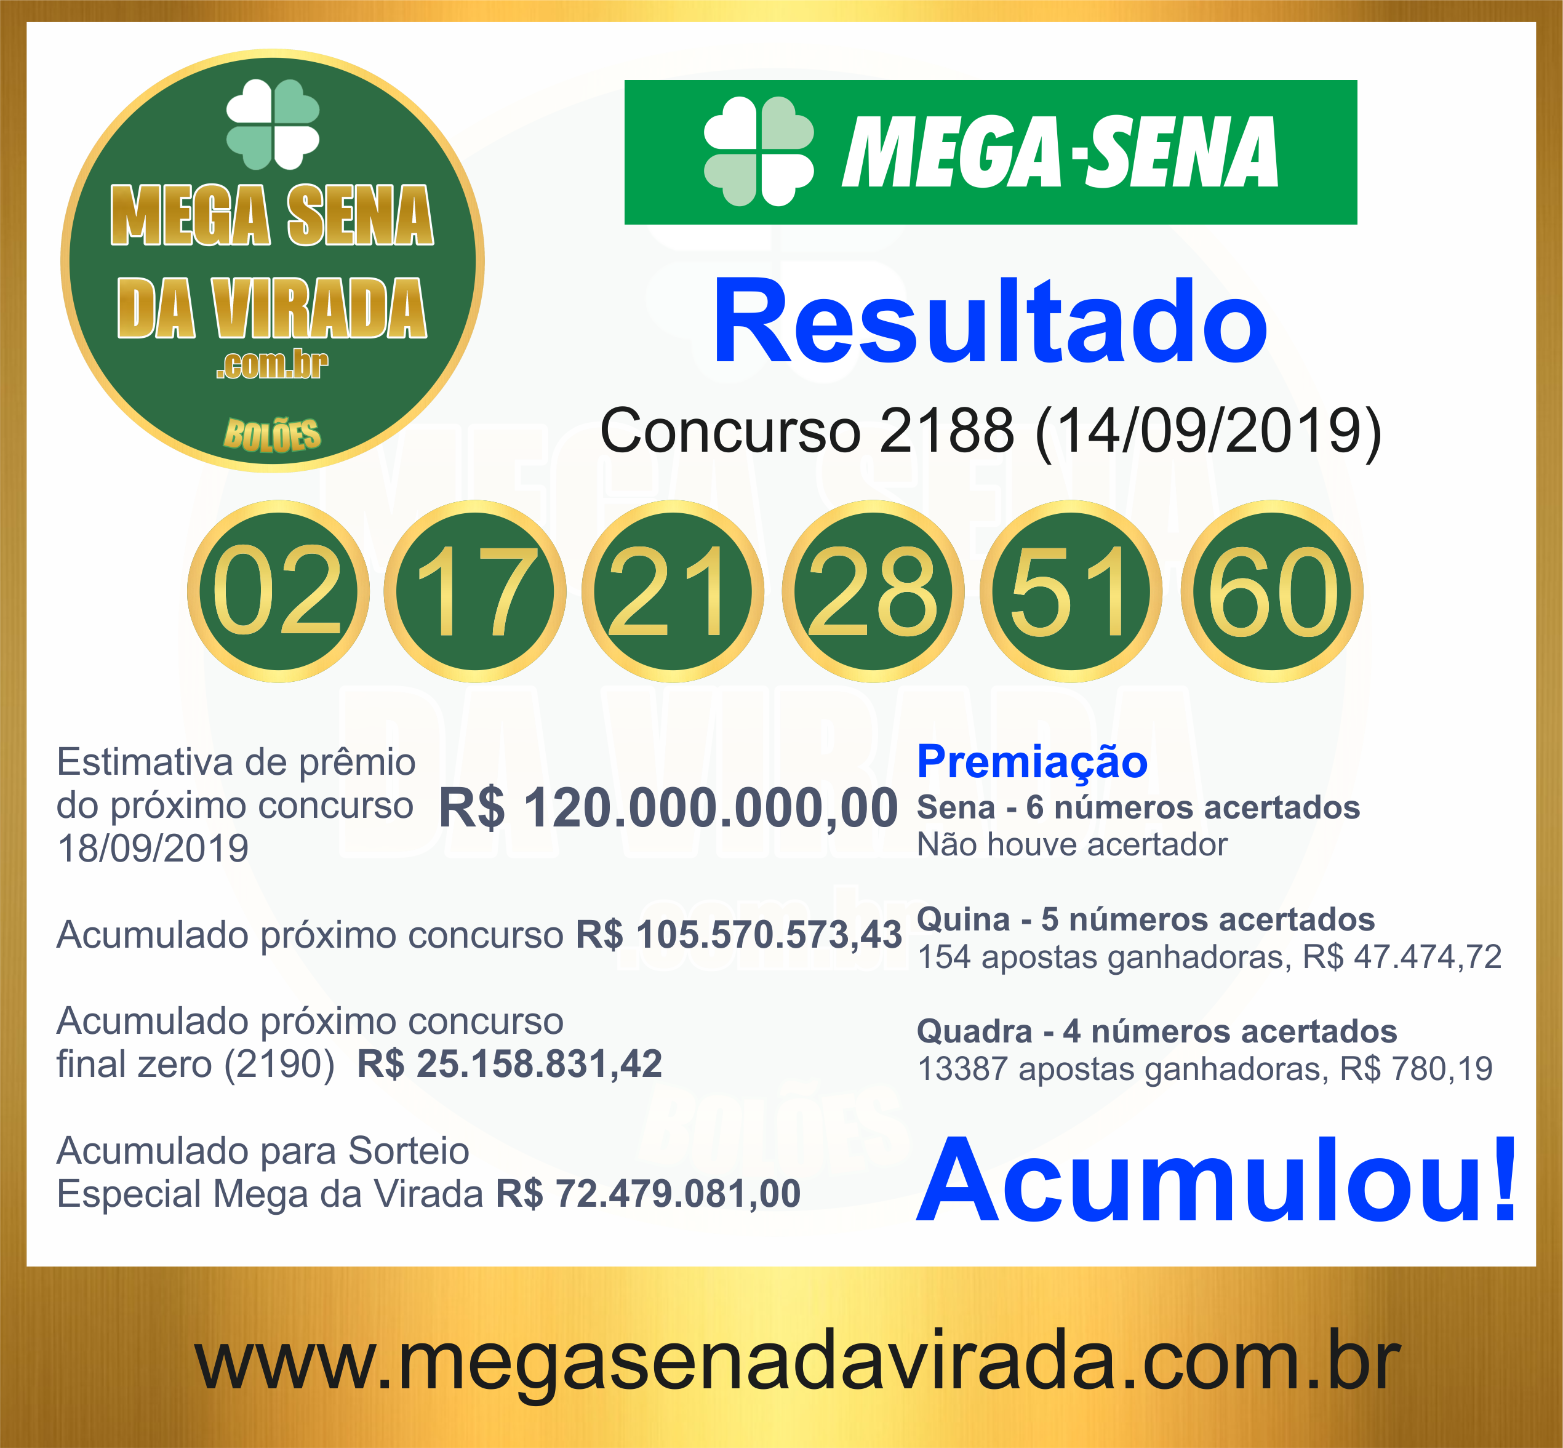 Mega Sena Concurso 2188 14/09/2019